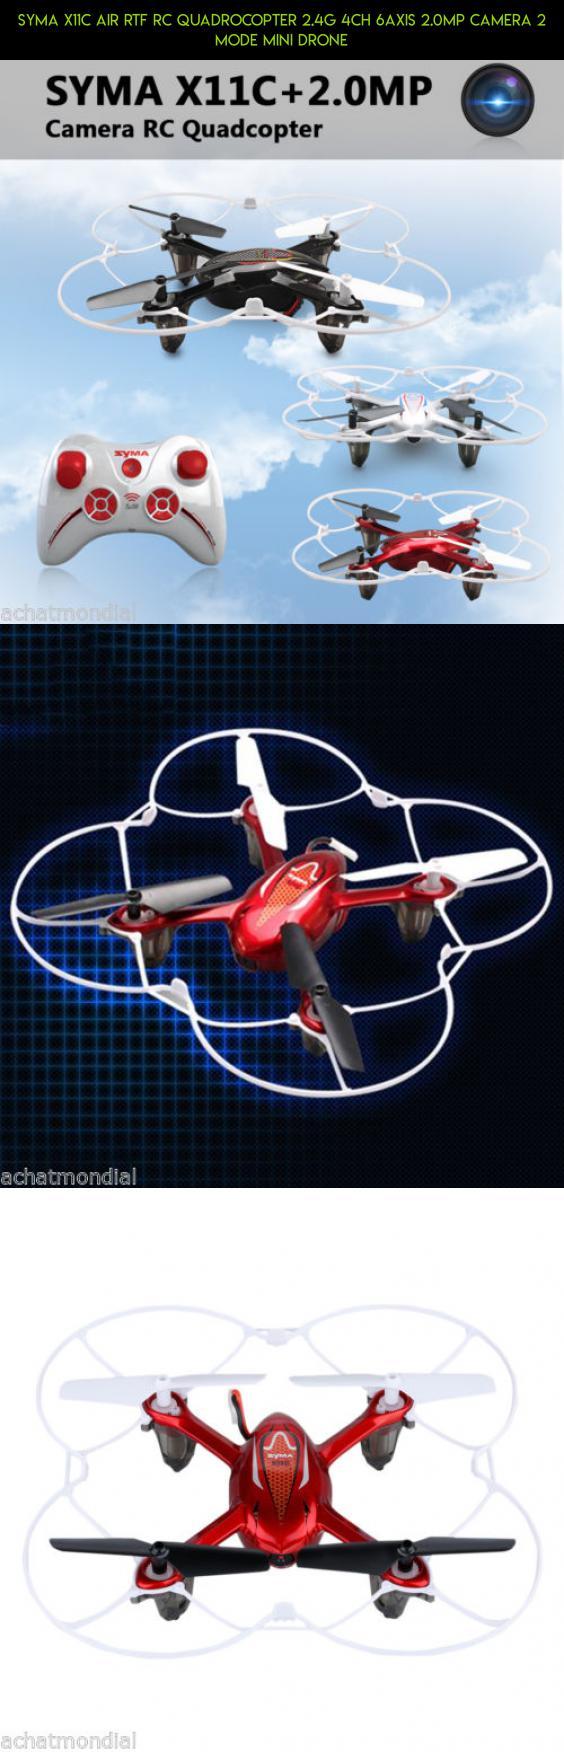 Syma X11c Air Rtf Rc Quadrocopter 24g 4ch 6axis 20mp Camera 2 Mode Quadcopter X8c Venture 24ghz With Mp Full Hd White Mini